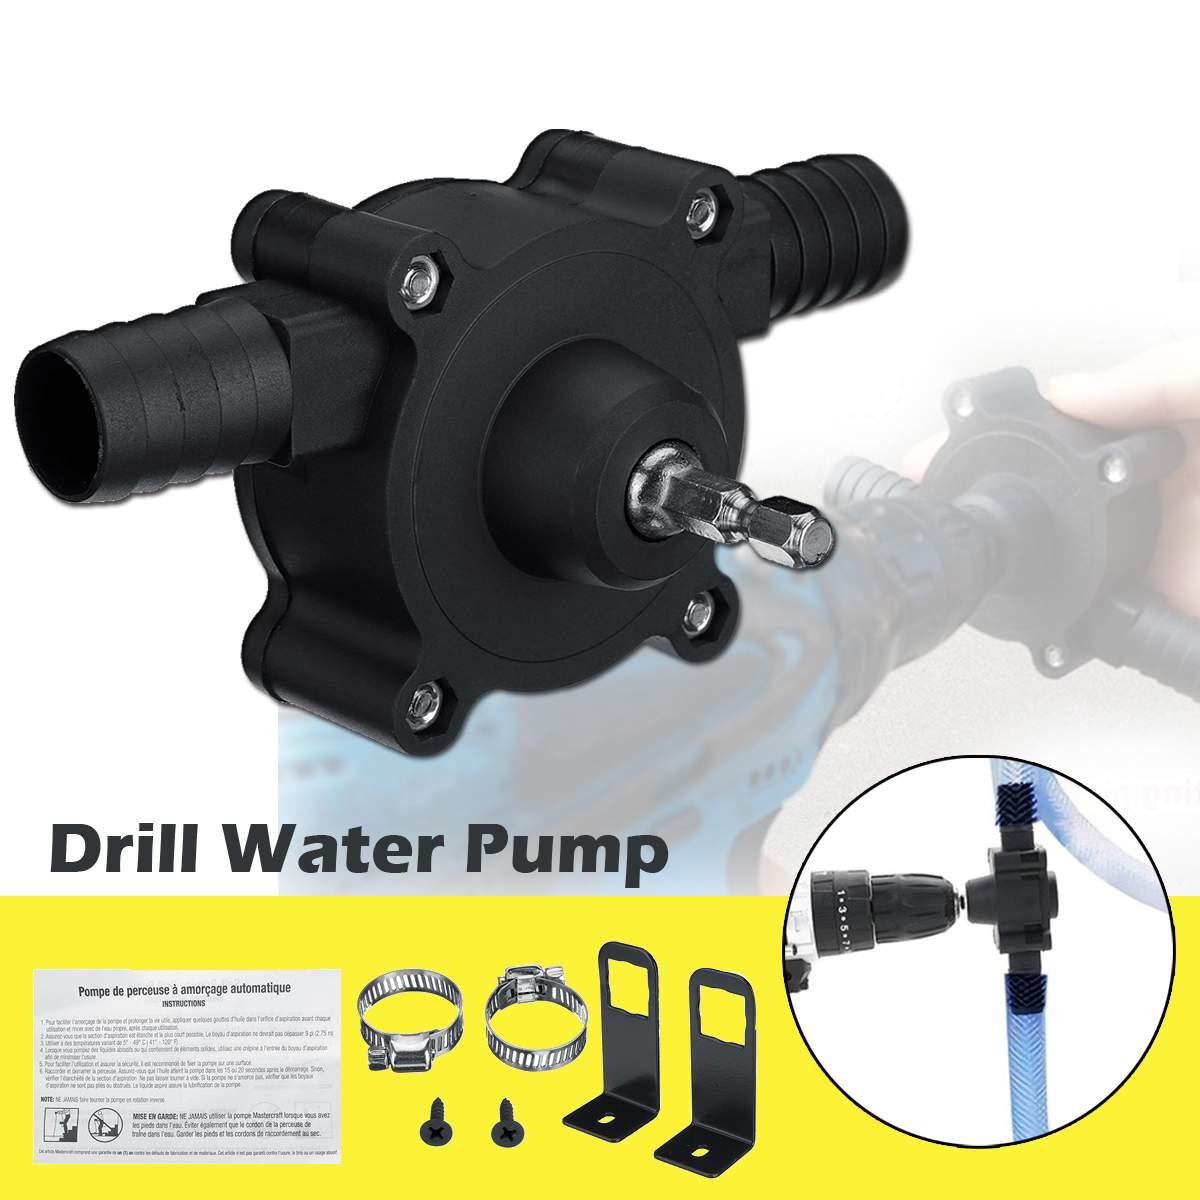 Portable Hand Electric Drill Driver Pump Miniature Self-priming Pump Transfer Pumps Oil Fluid Screwdrive Water Pump High Flow